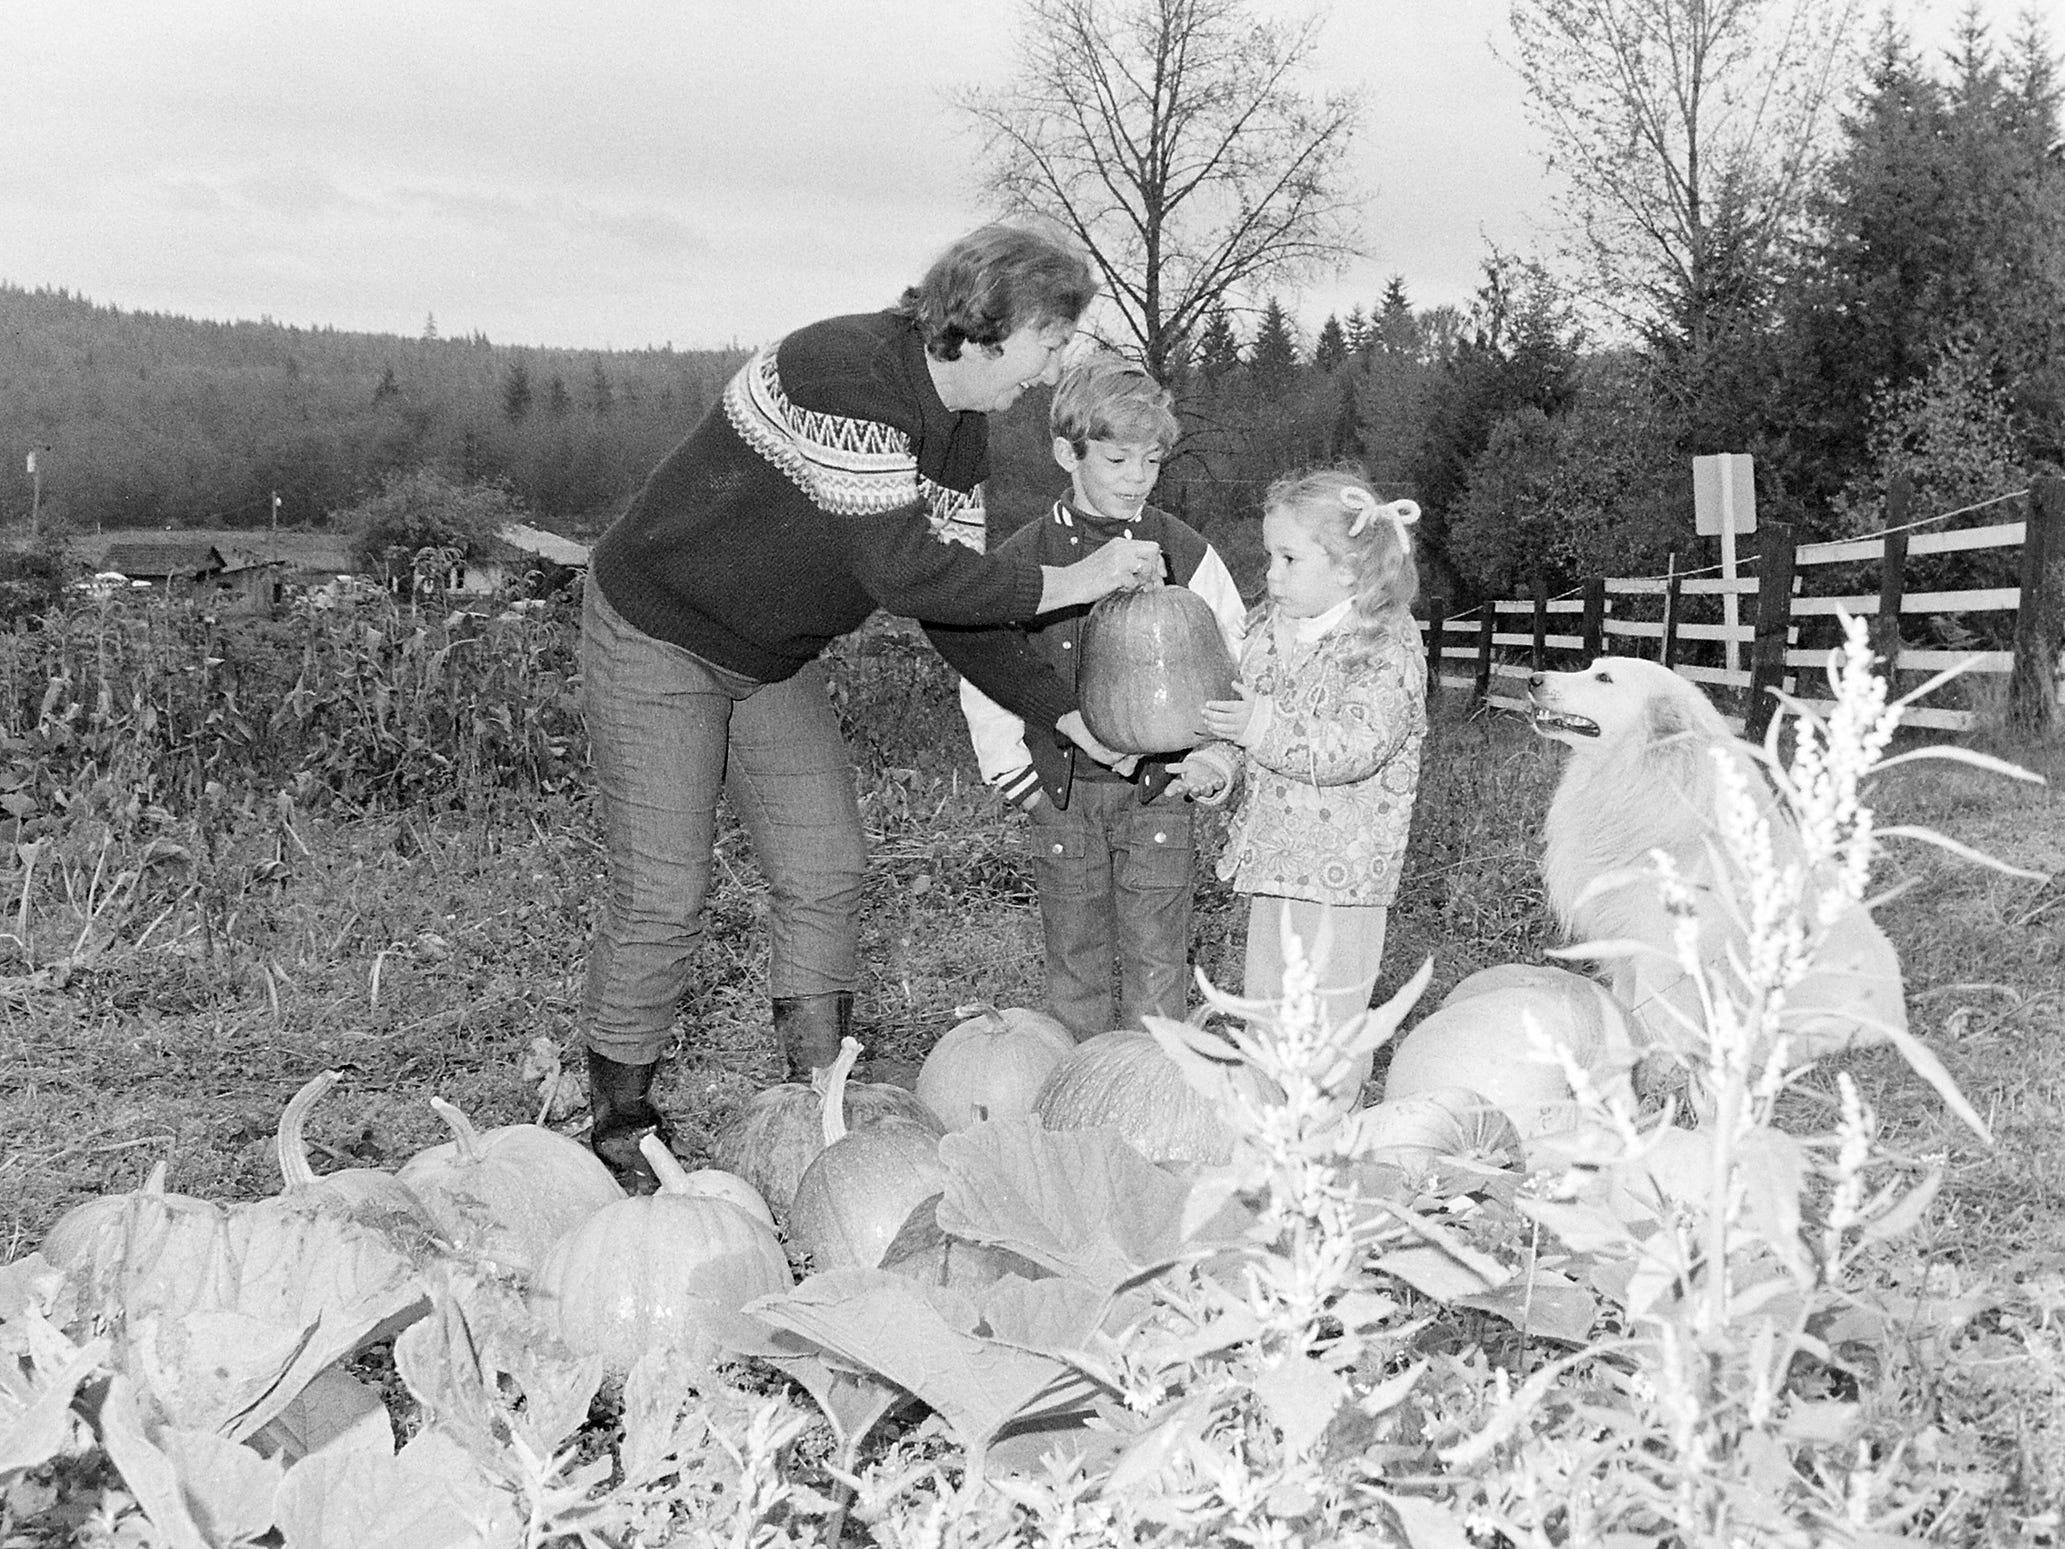 10/24/73Pumpkin Picking